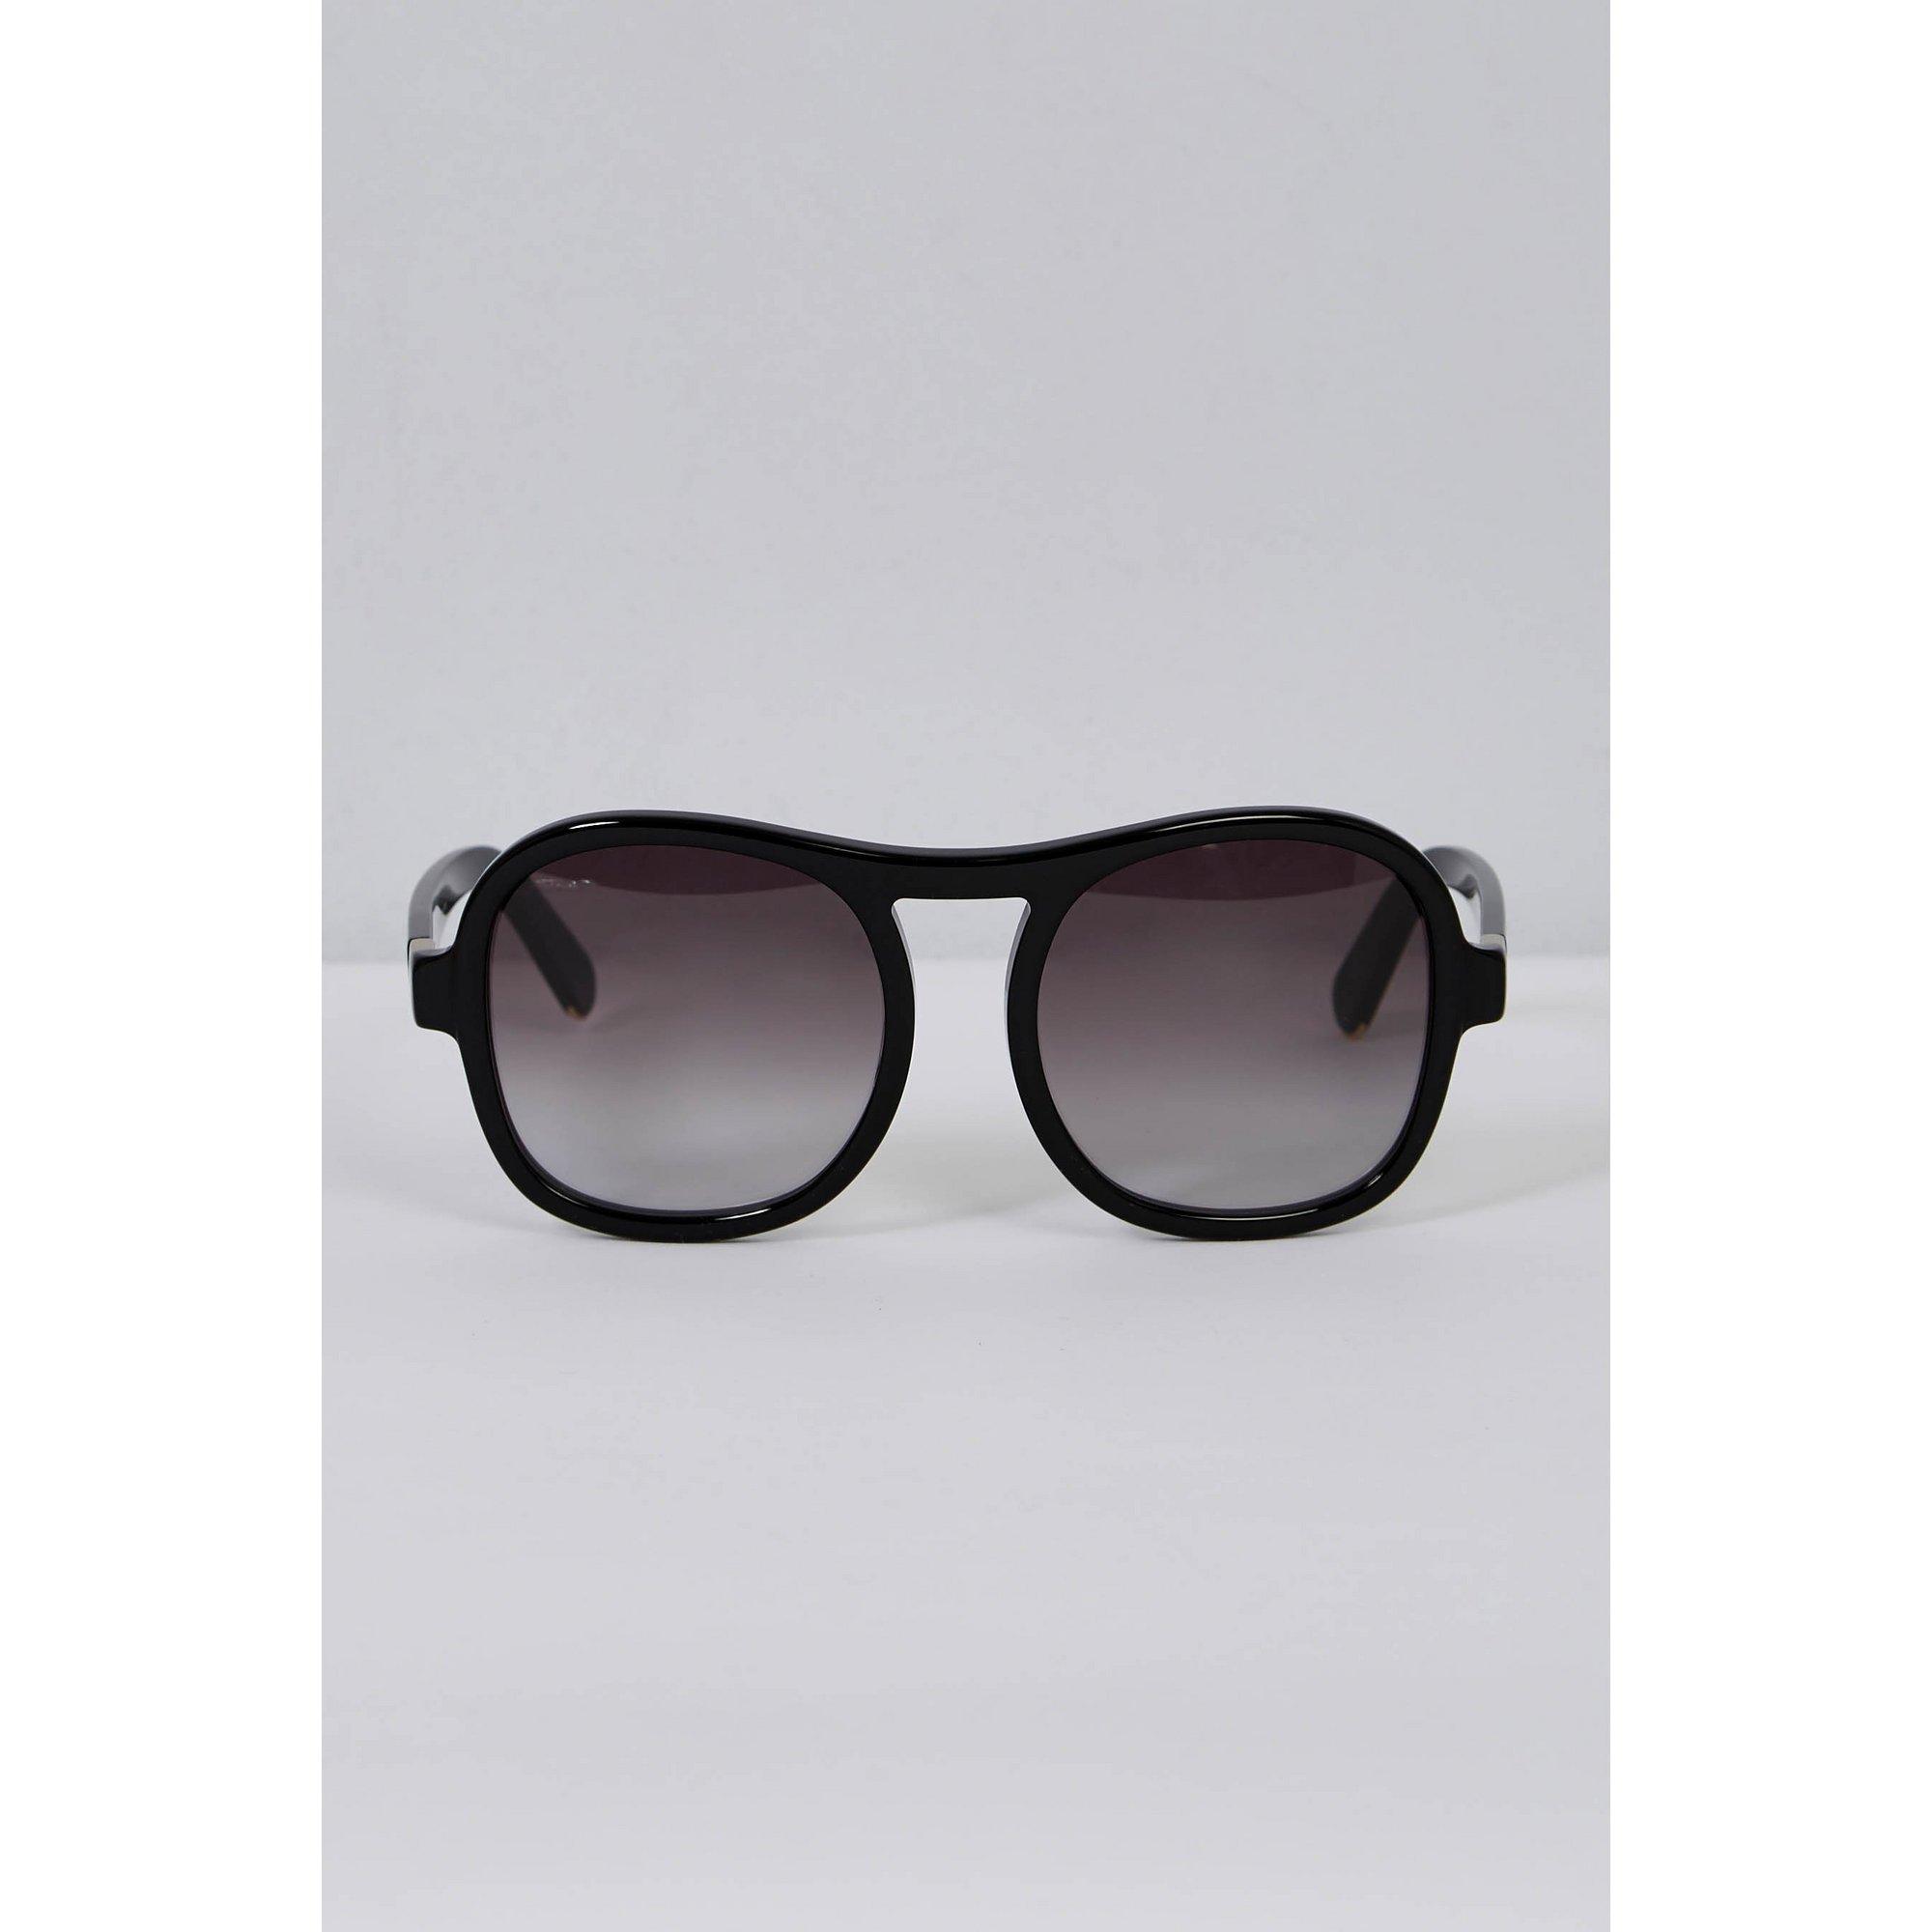 Image of Chloe Grad Black Square Sunglasses